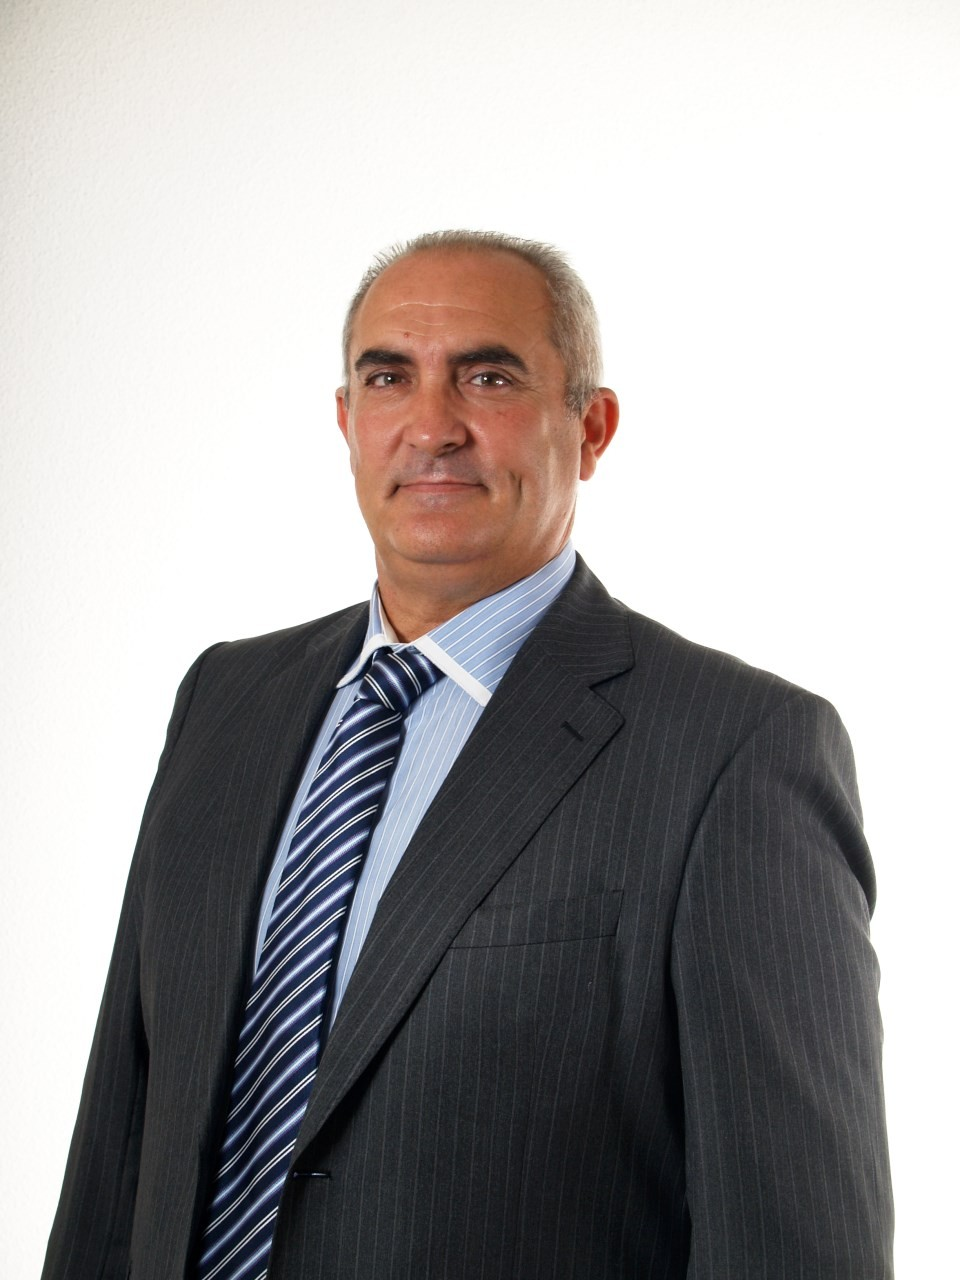 José Manuel Núñez Crespo